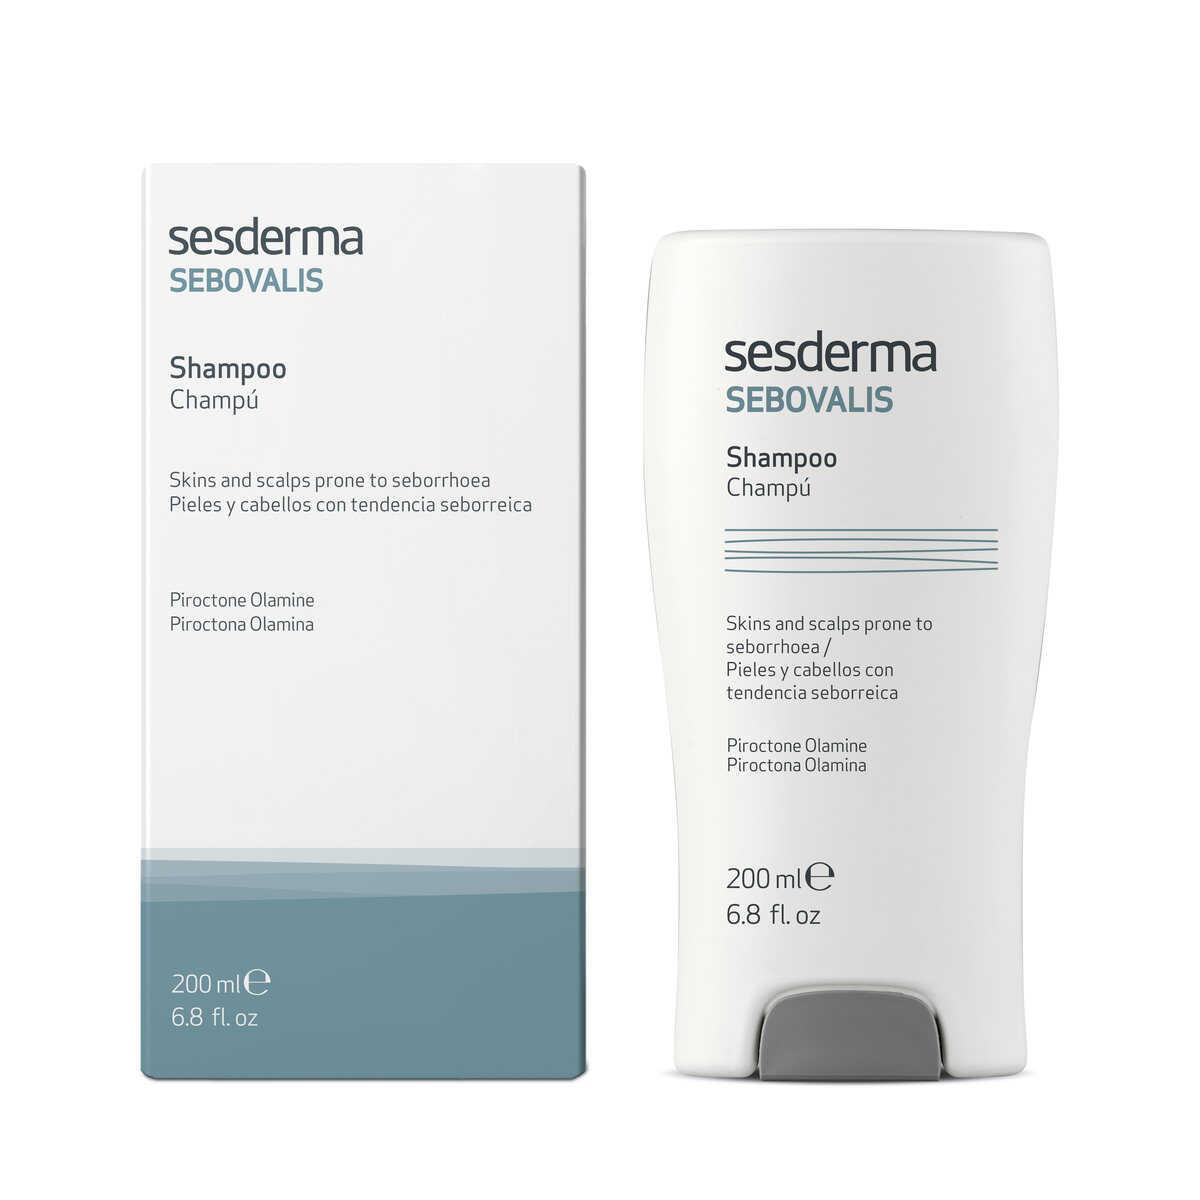 SESDERMA SEBOVALIS Shampoo